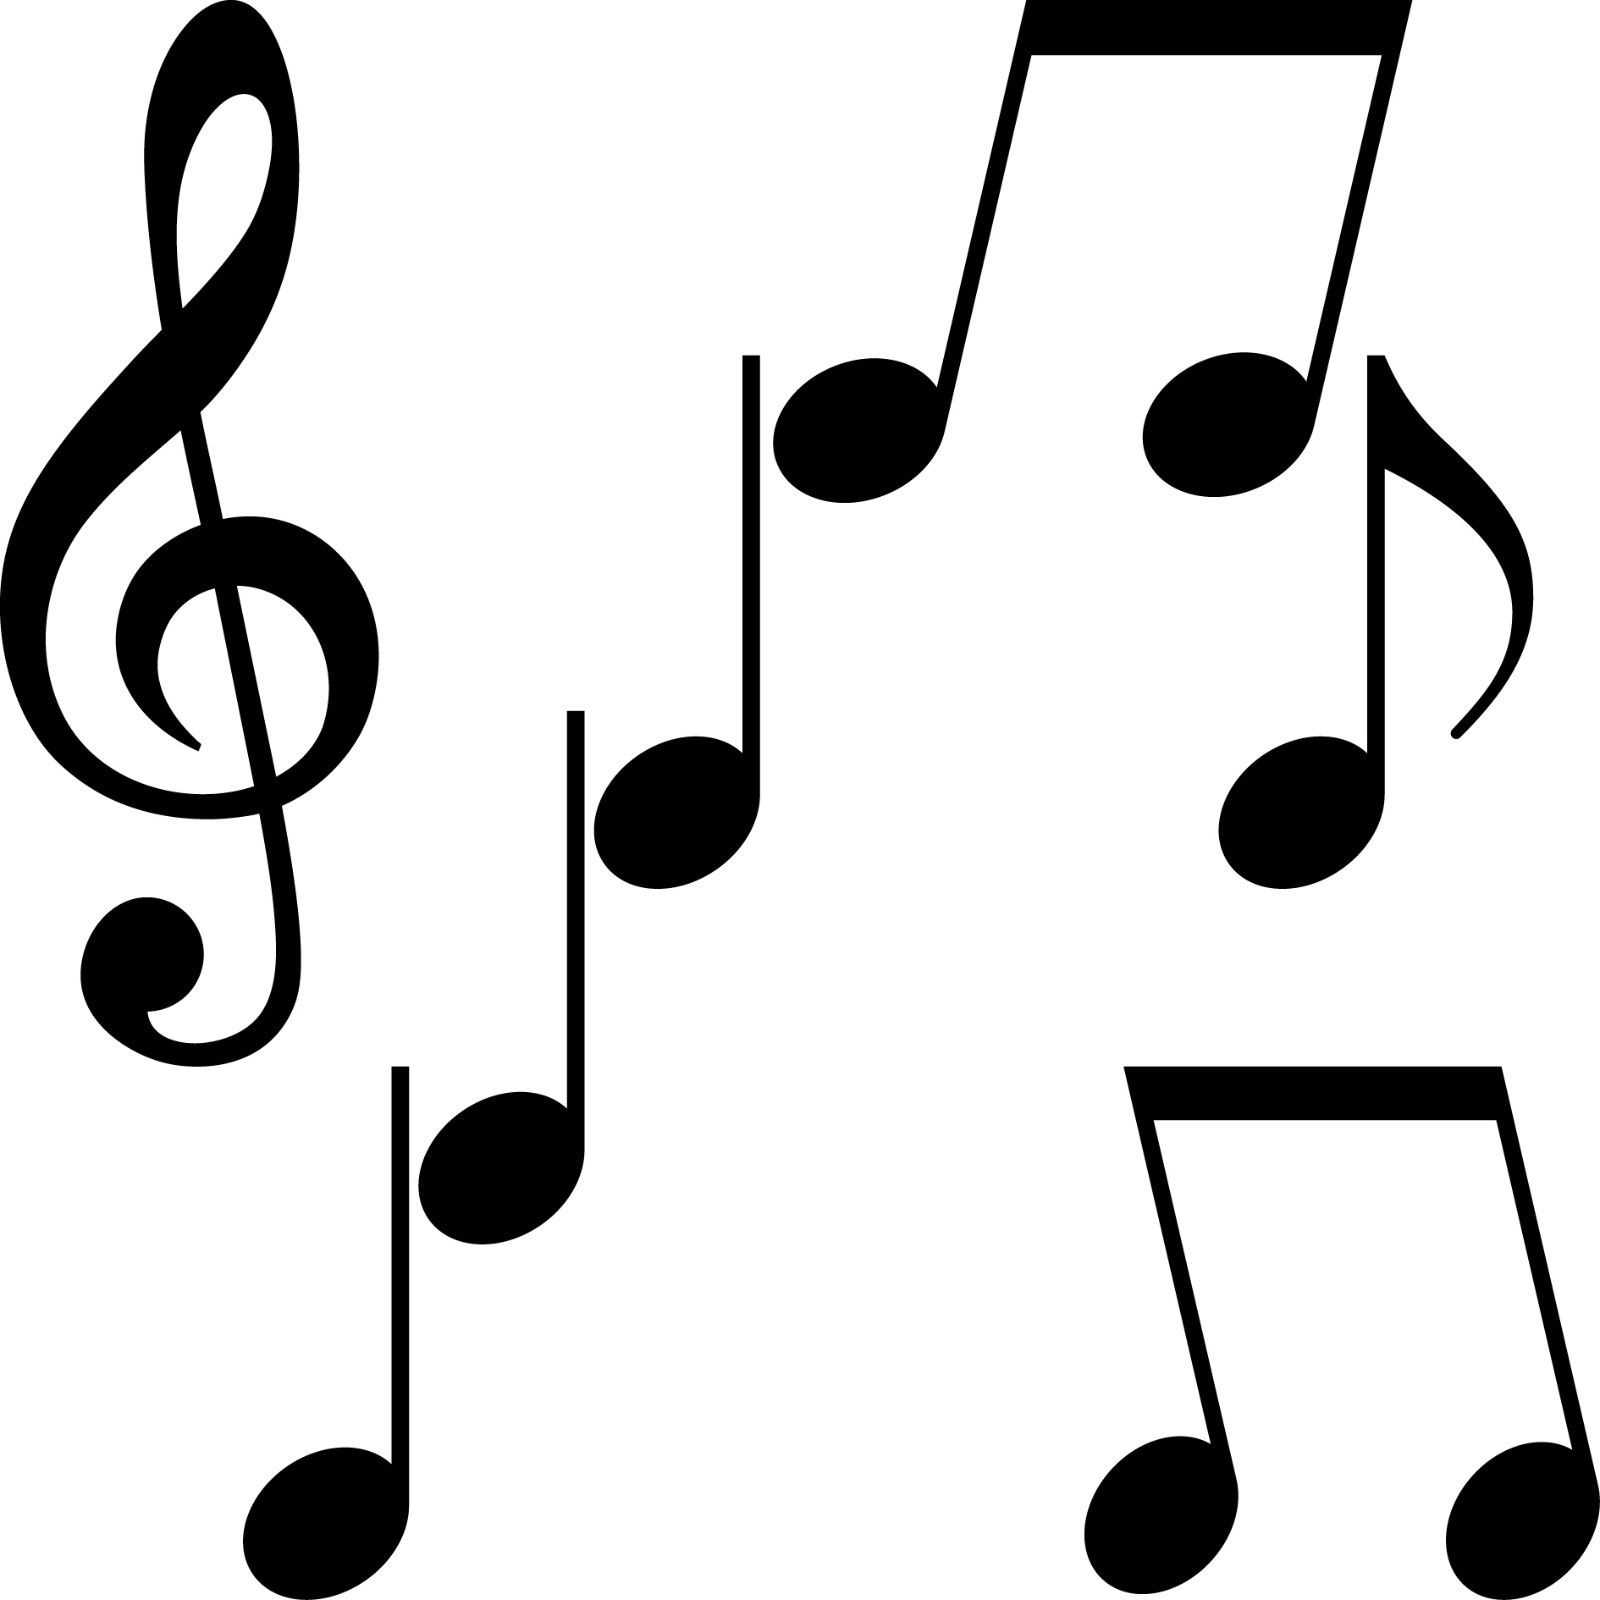 noten set m violinschlüssel violin schlüssel musik auto